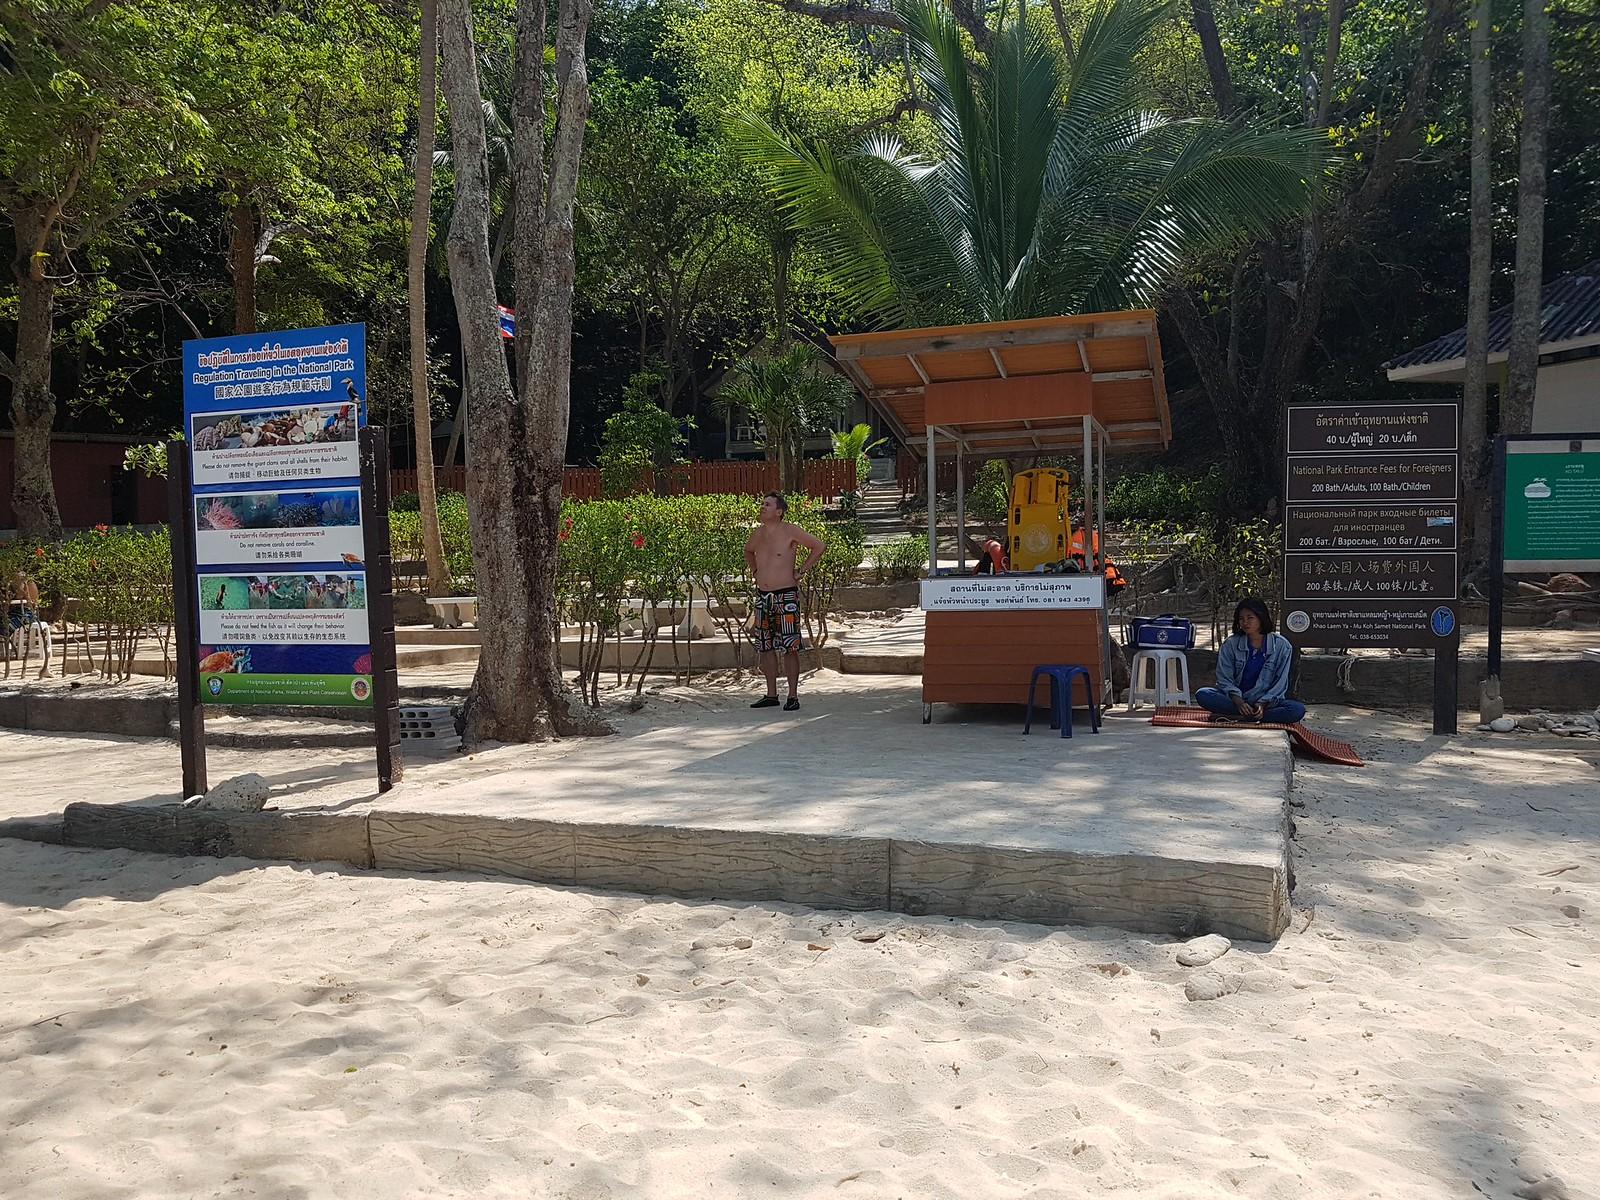 Koh Tha Lu - ติดต่อเจ้าหน้าที่ เกาะทะลุ ระยอง